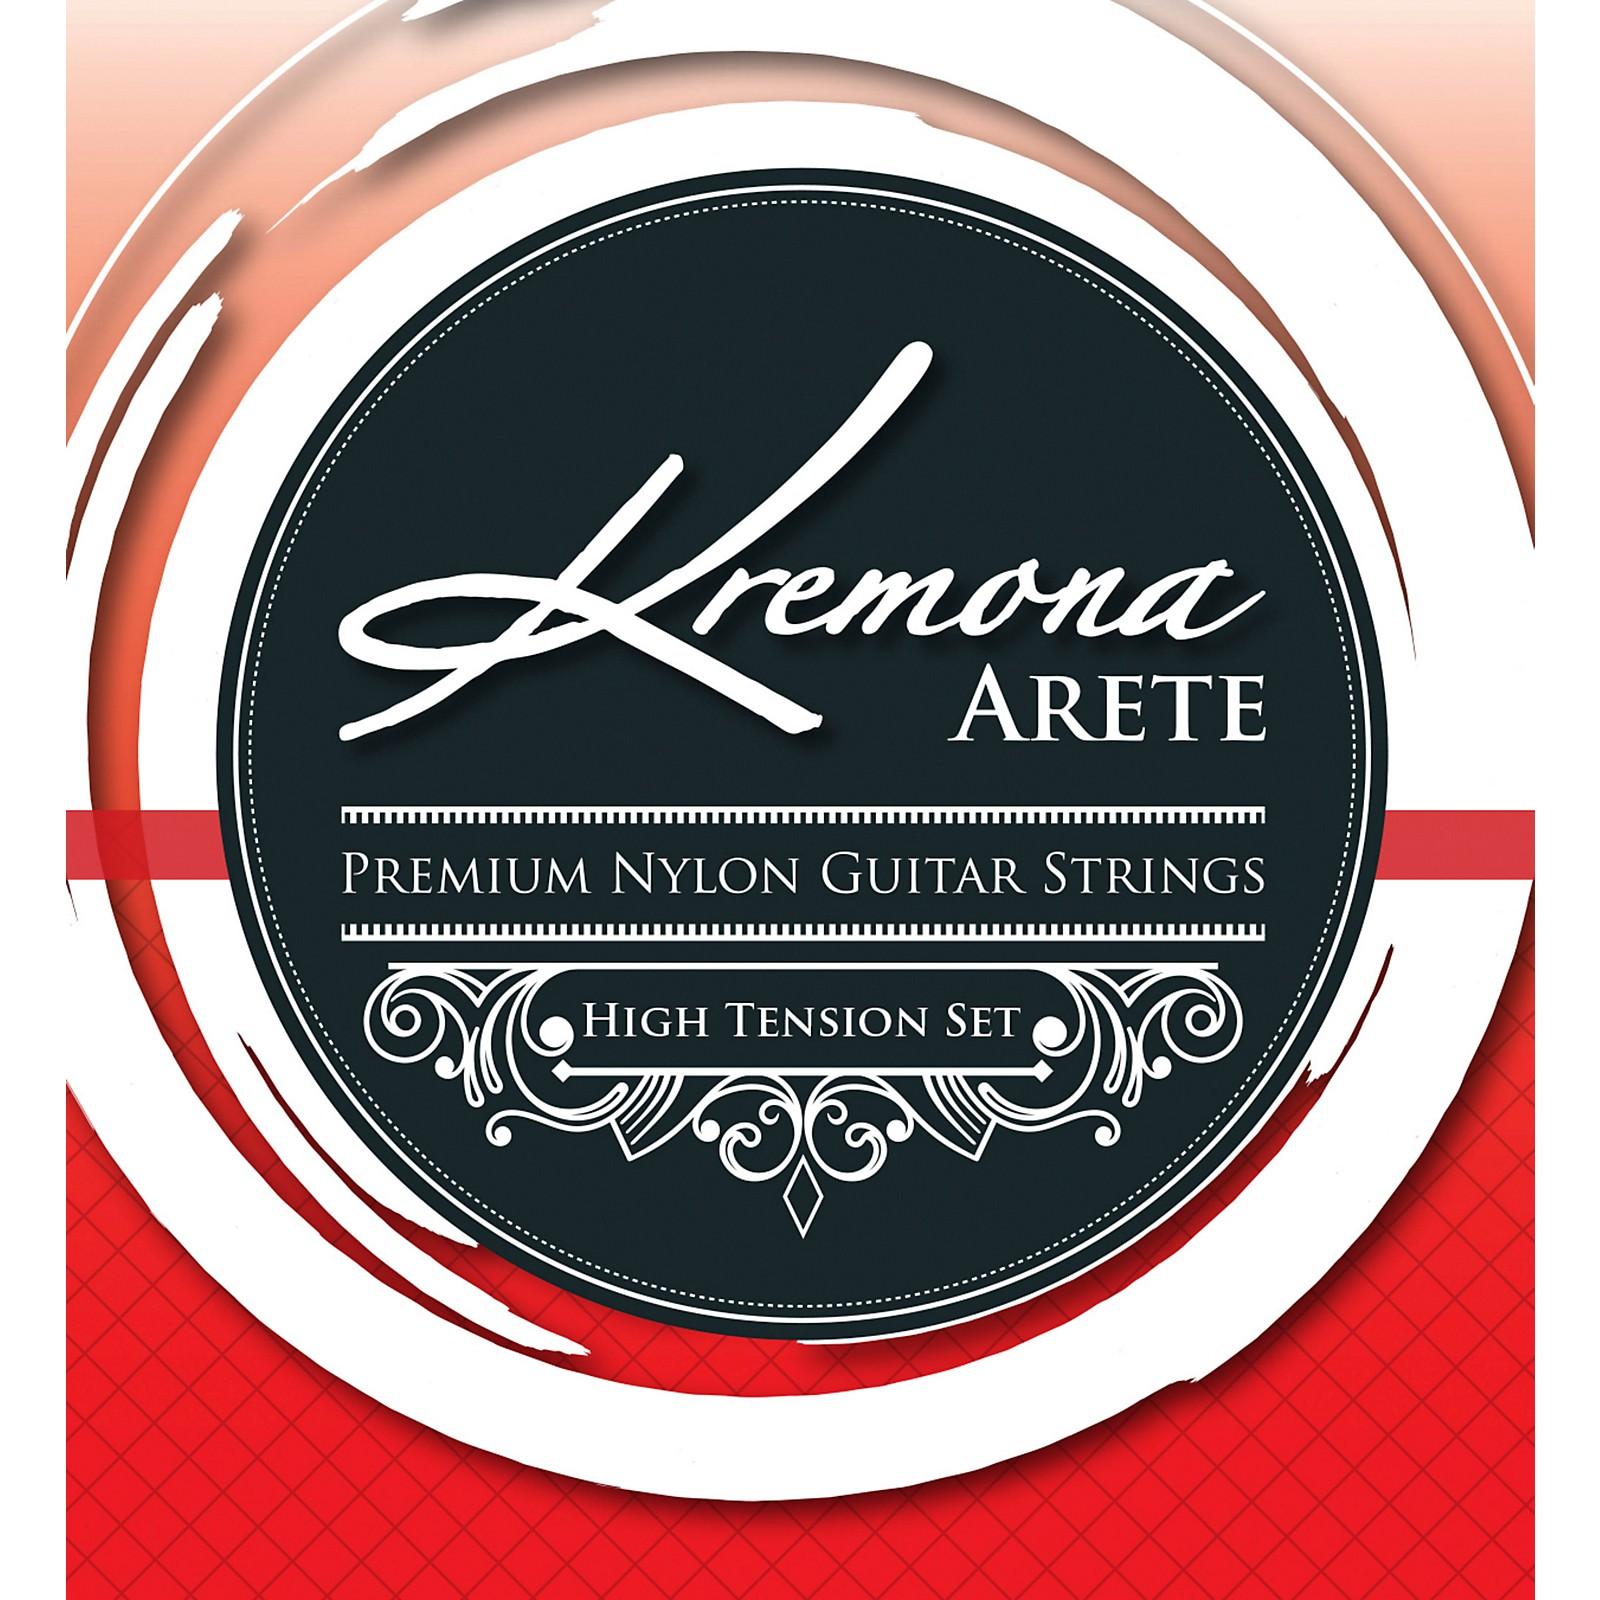 Kremona Arete Premium Nylon Guitar Strings